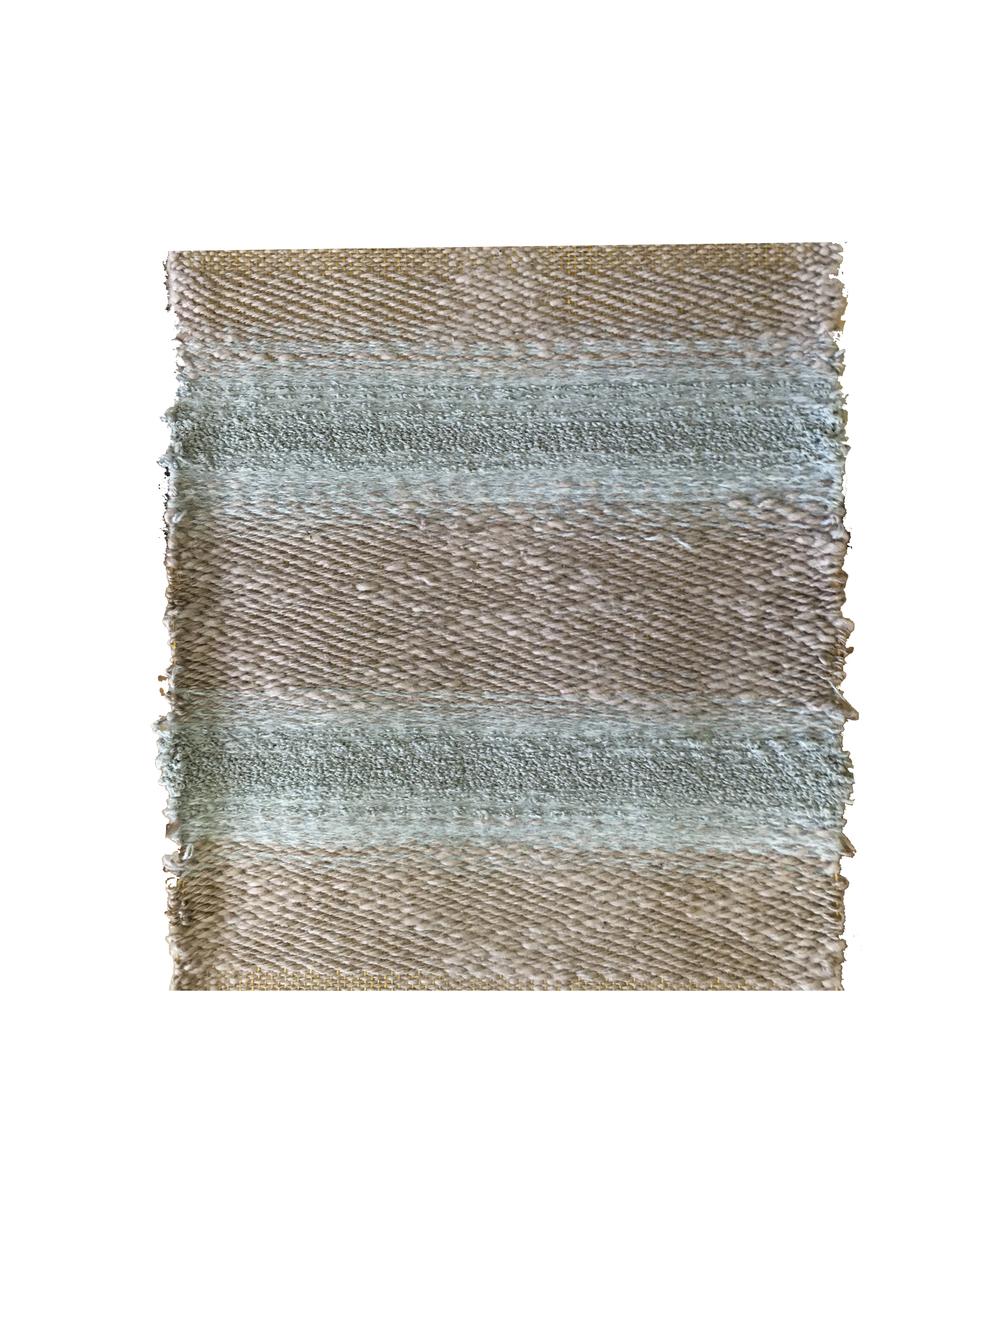 weaving 1-sample4.jpg